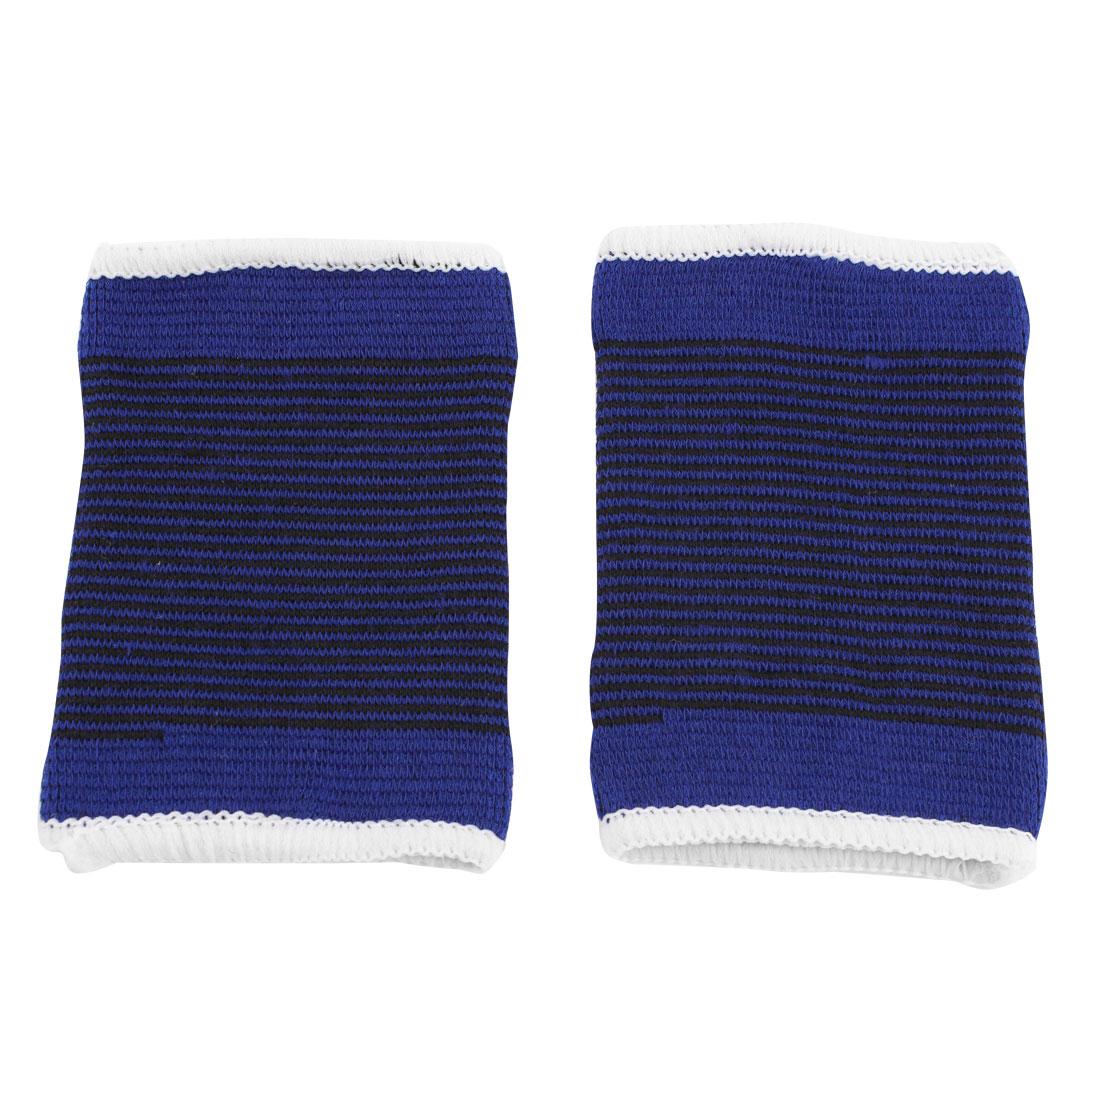 Sports Polyester Elastic Carpal Tunnel Support Sprain Band Strap Wrist Brace Blue 2 Pcs